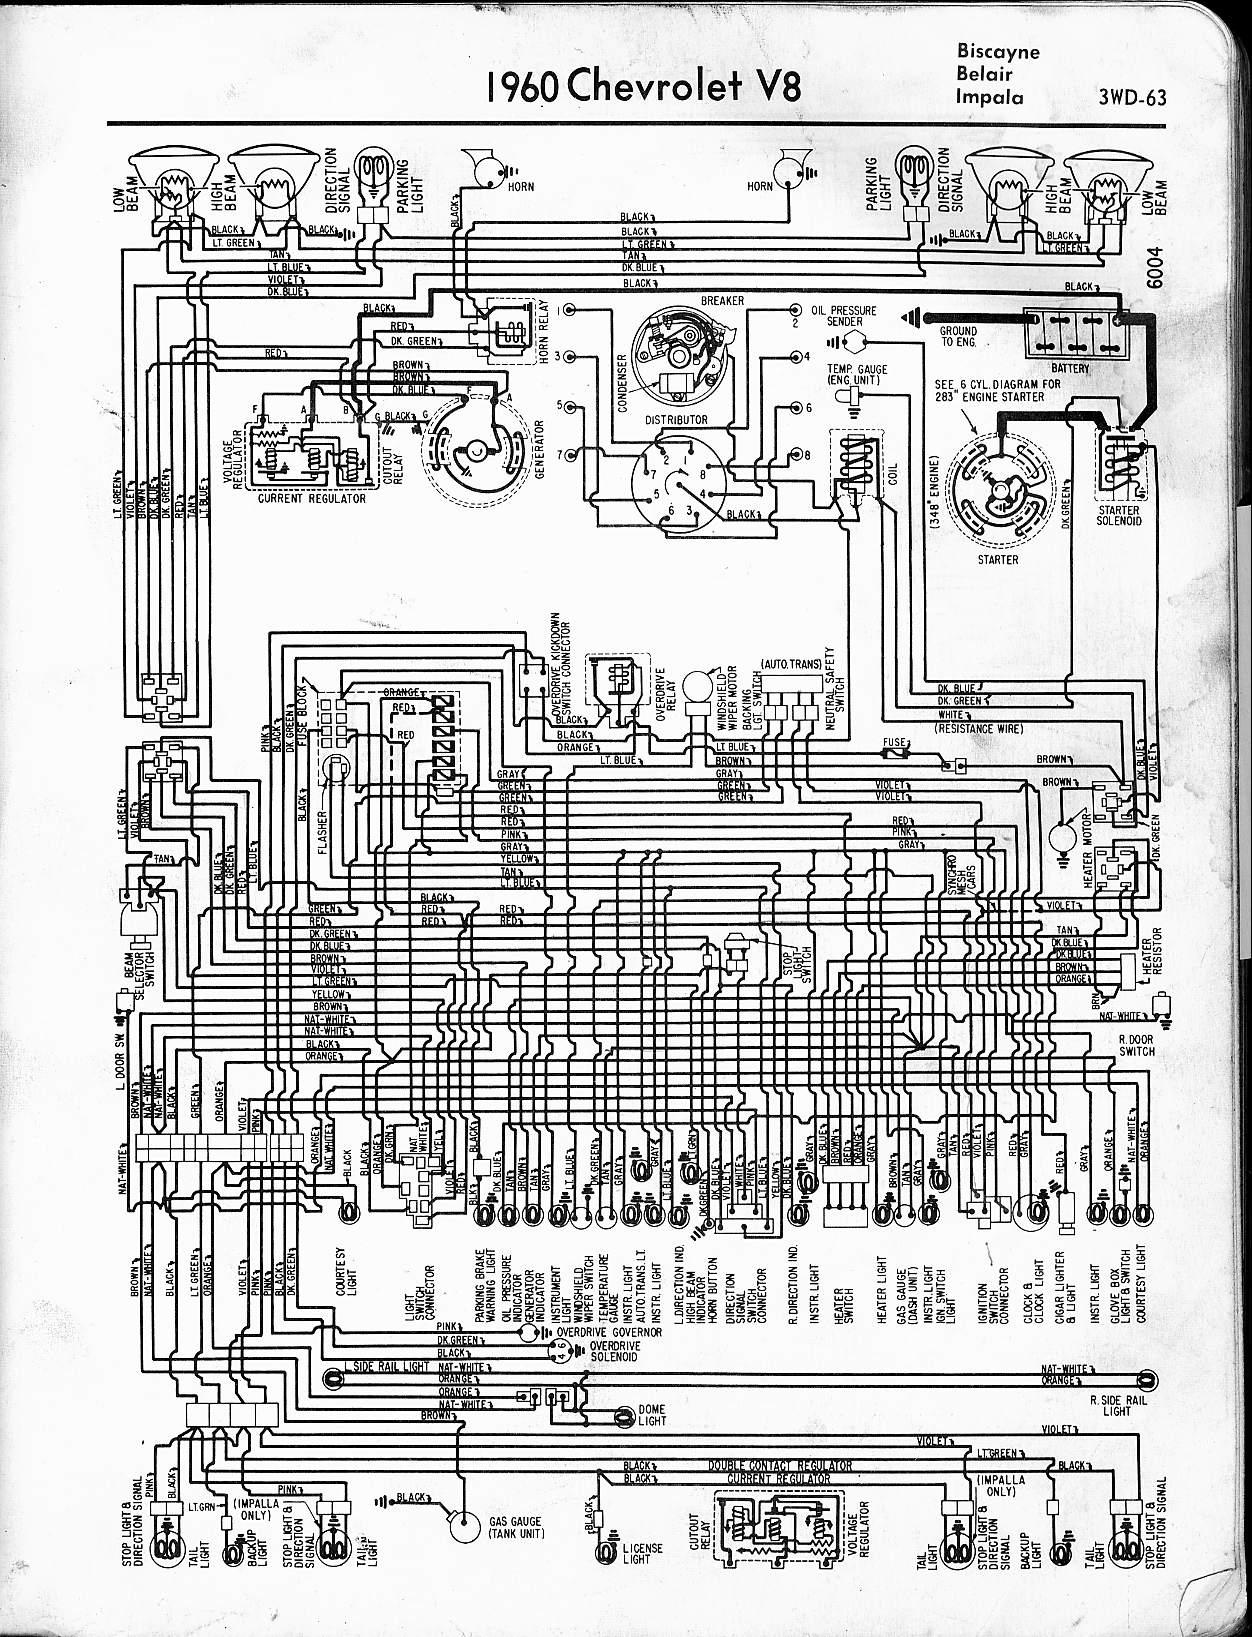 2003 Chevy Impala Wiring Diagram